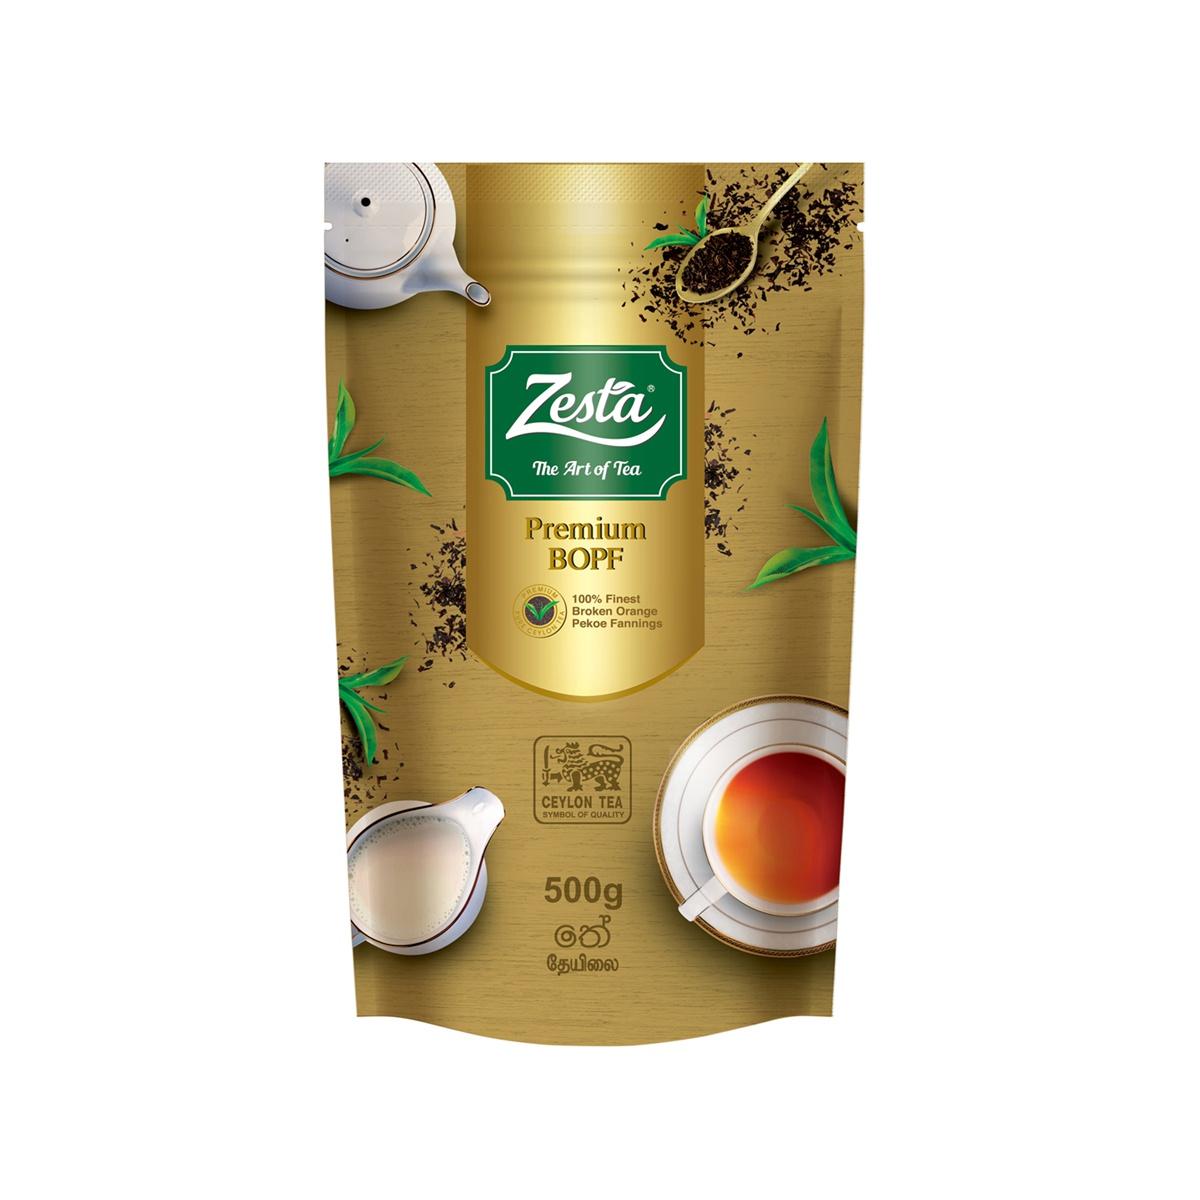 Zesta Tea 500G - in Sri Lanka